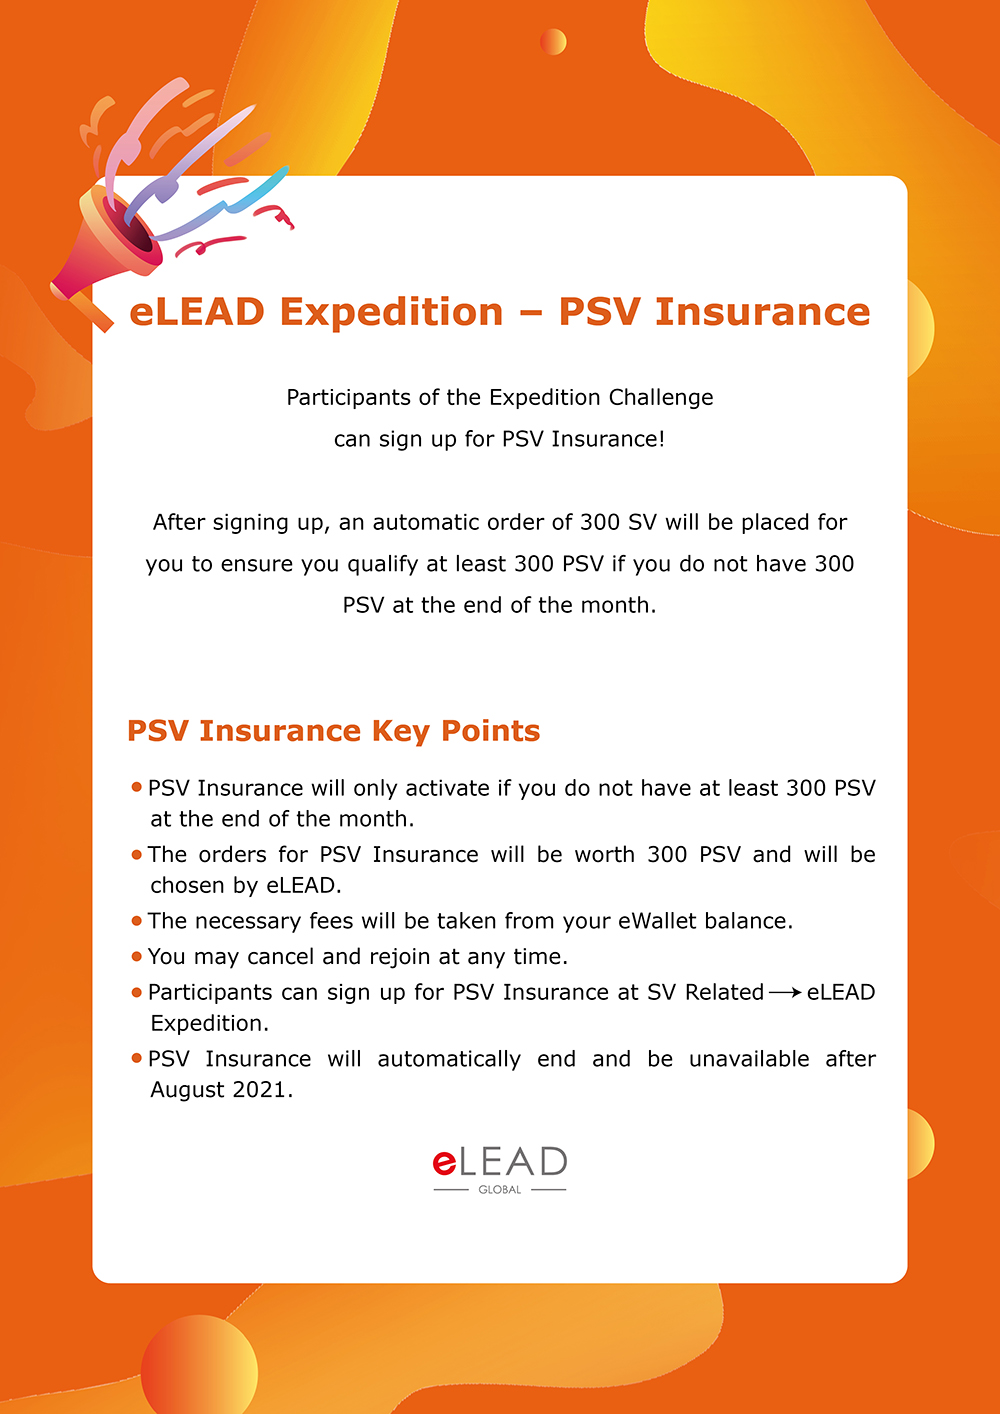 eLEAD Expedition – PSV Insurance